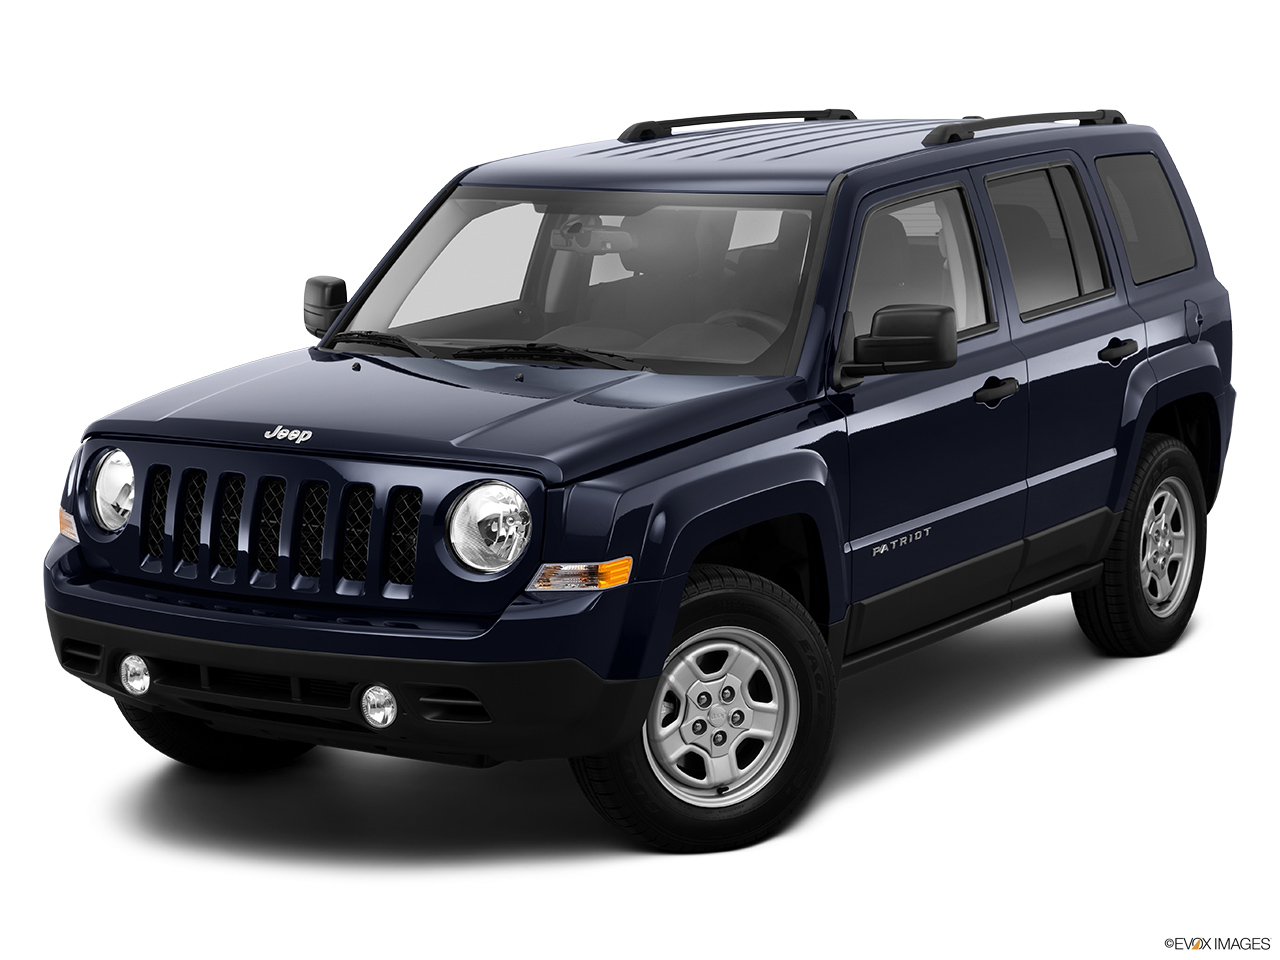 2014 jeep patriot fwd sport altitude edition. Black Bedroom Furniture Sets. Home Design Ideas